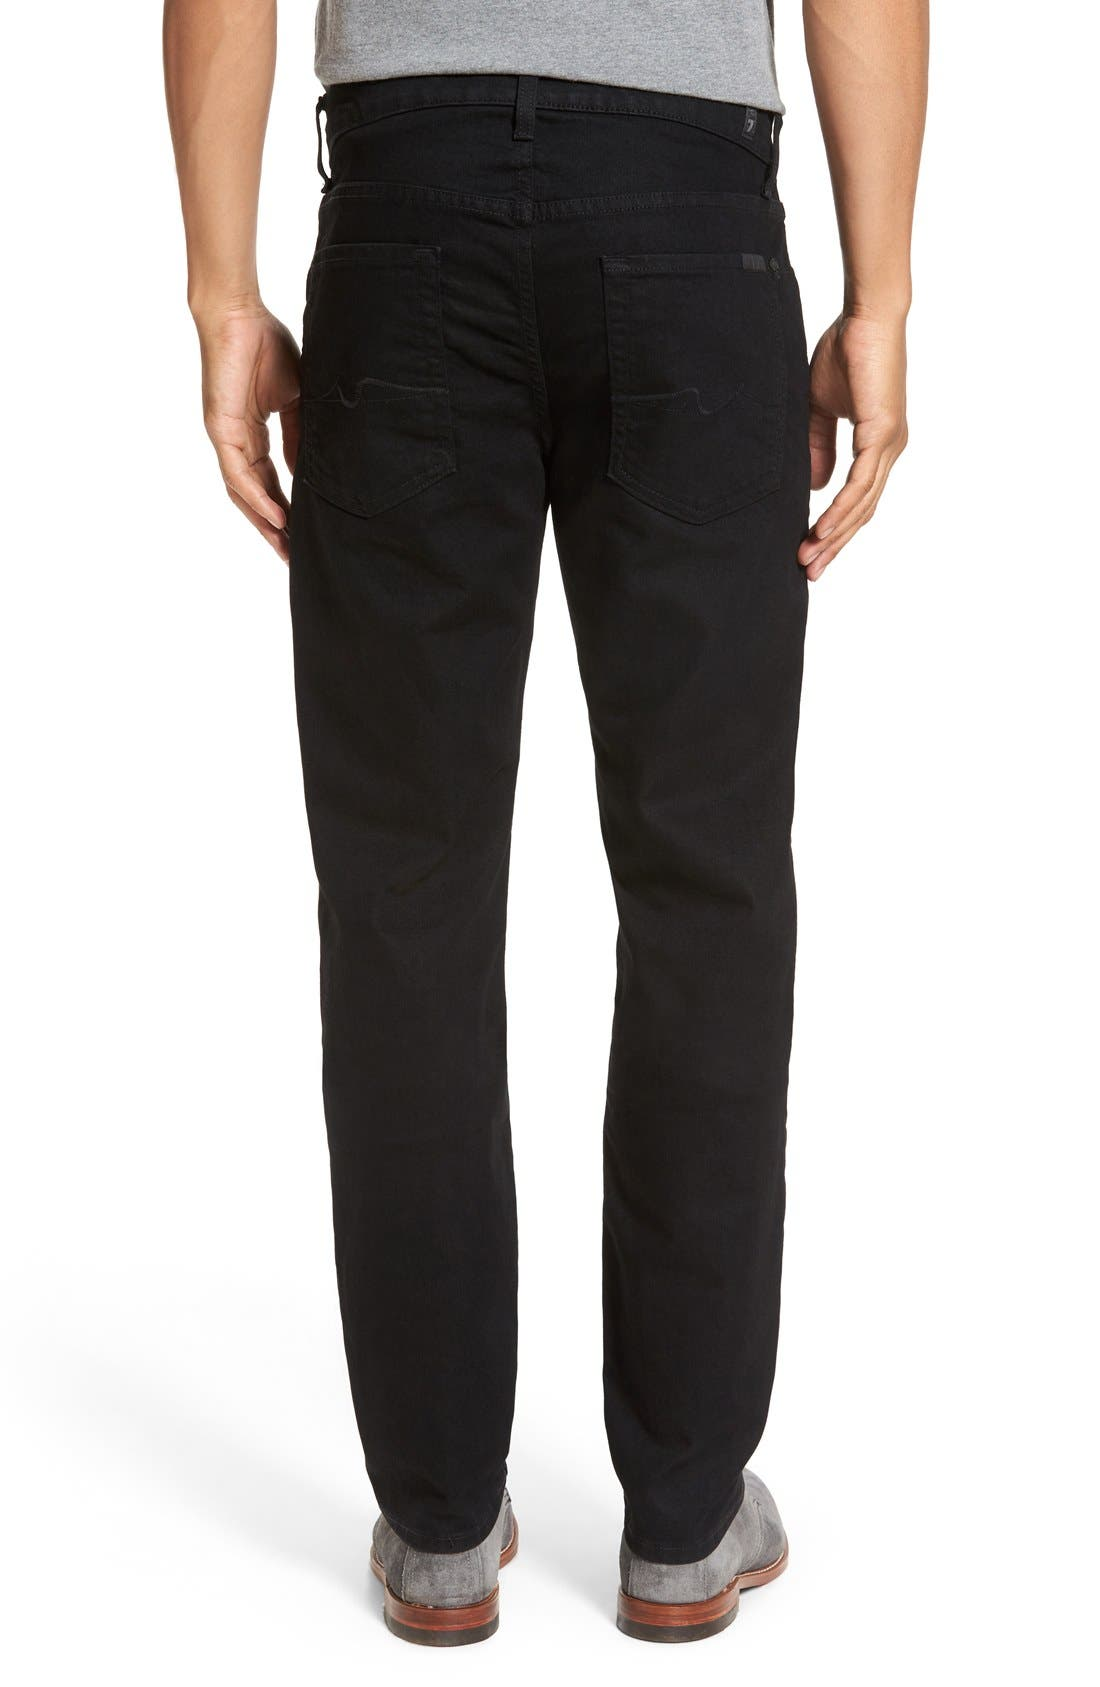 Slimmy Slim Fit Jeans,                             Alternate thumbnail 4, color,                             004